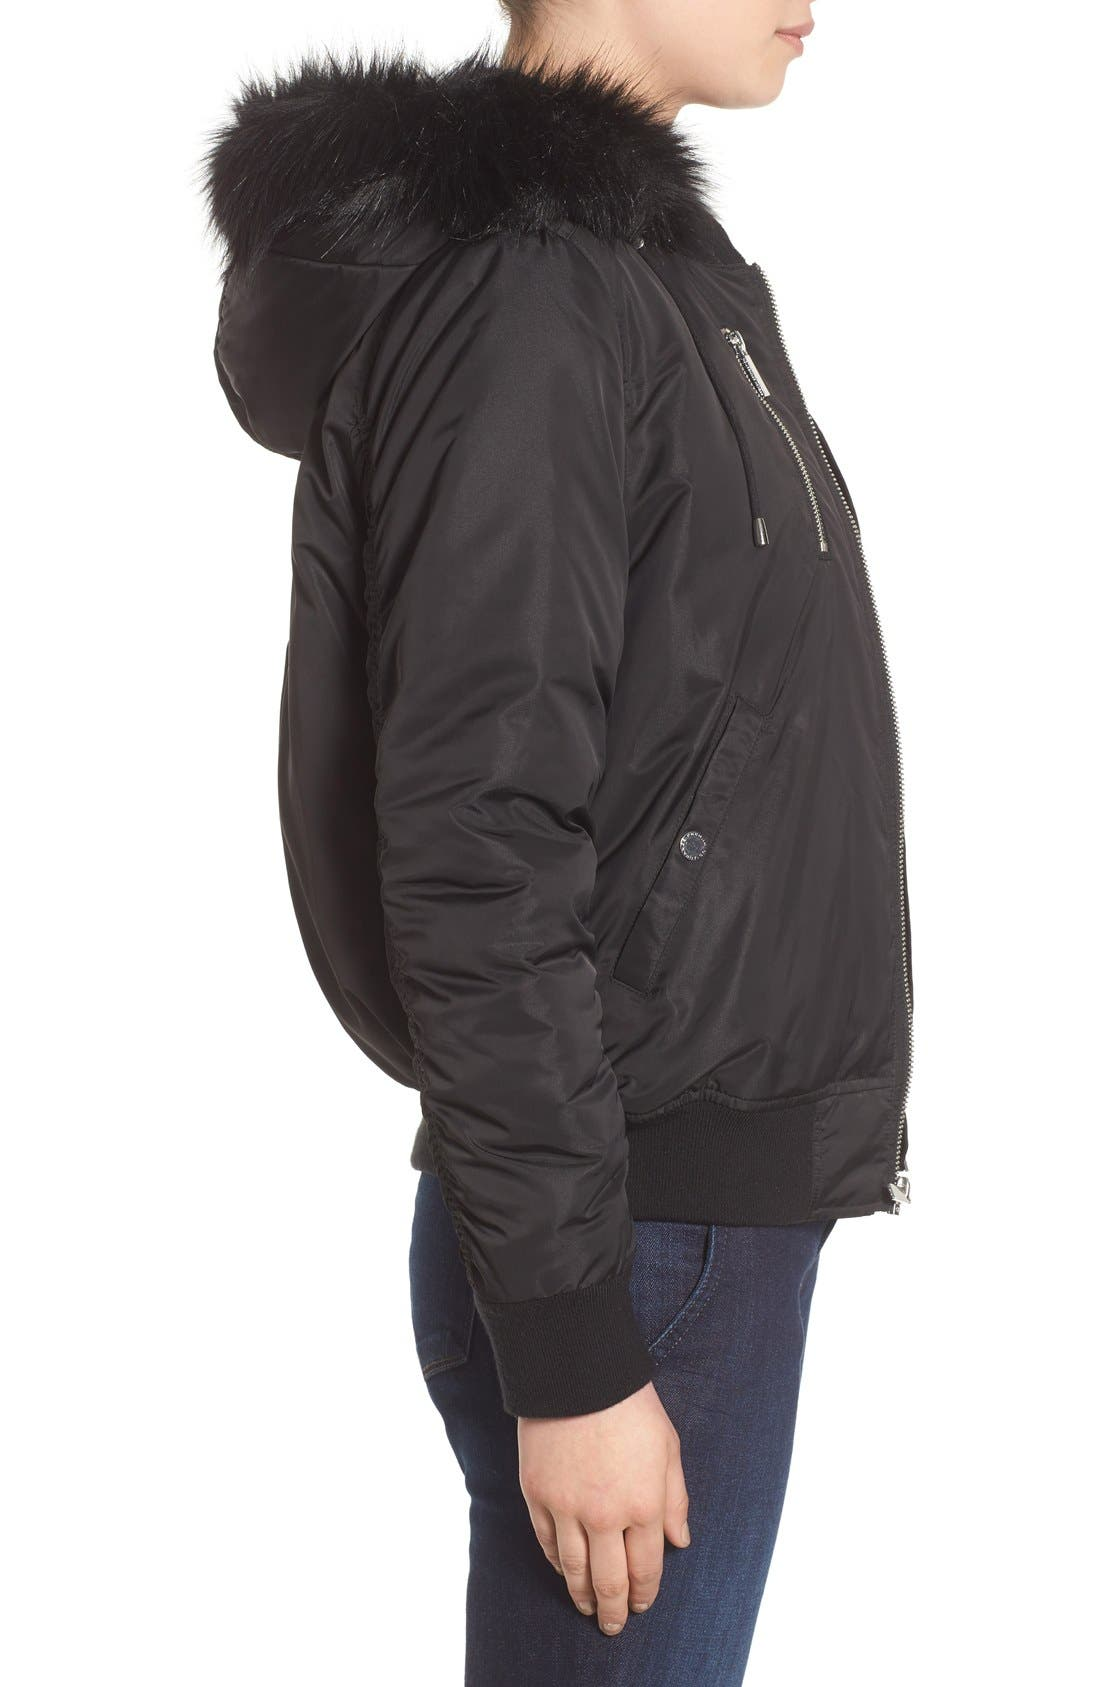 'Varsity' Hooded Bomber Jacket with Faux Fur Trim,                             Alternate thumbnail 3, color,                             Black